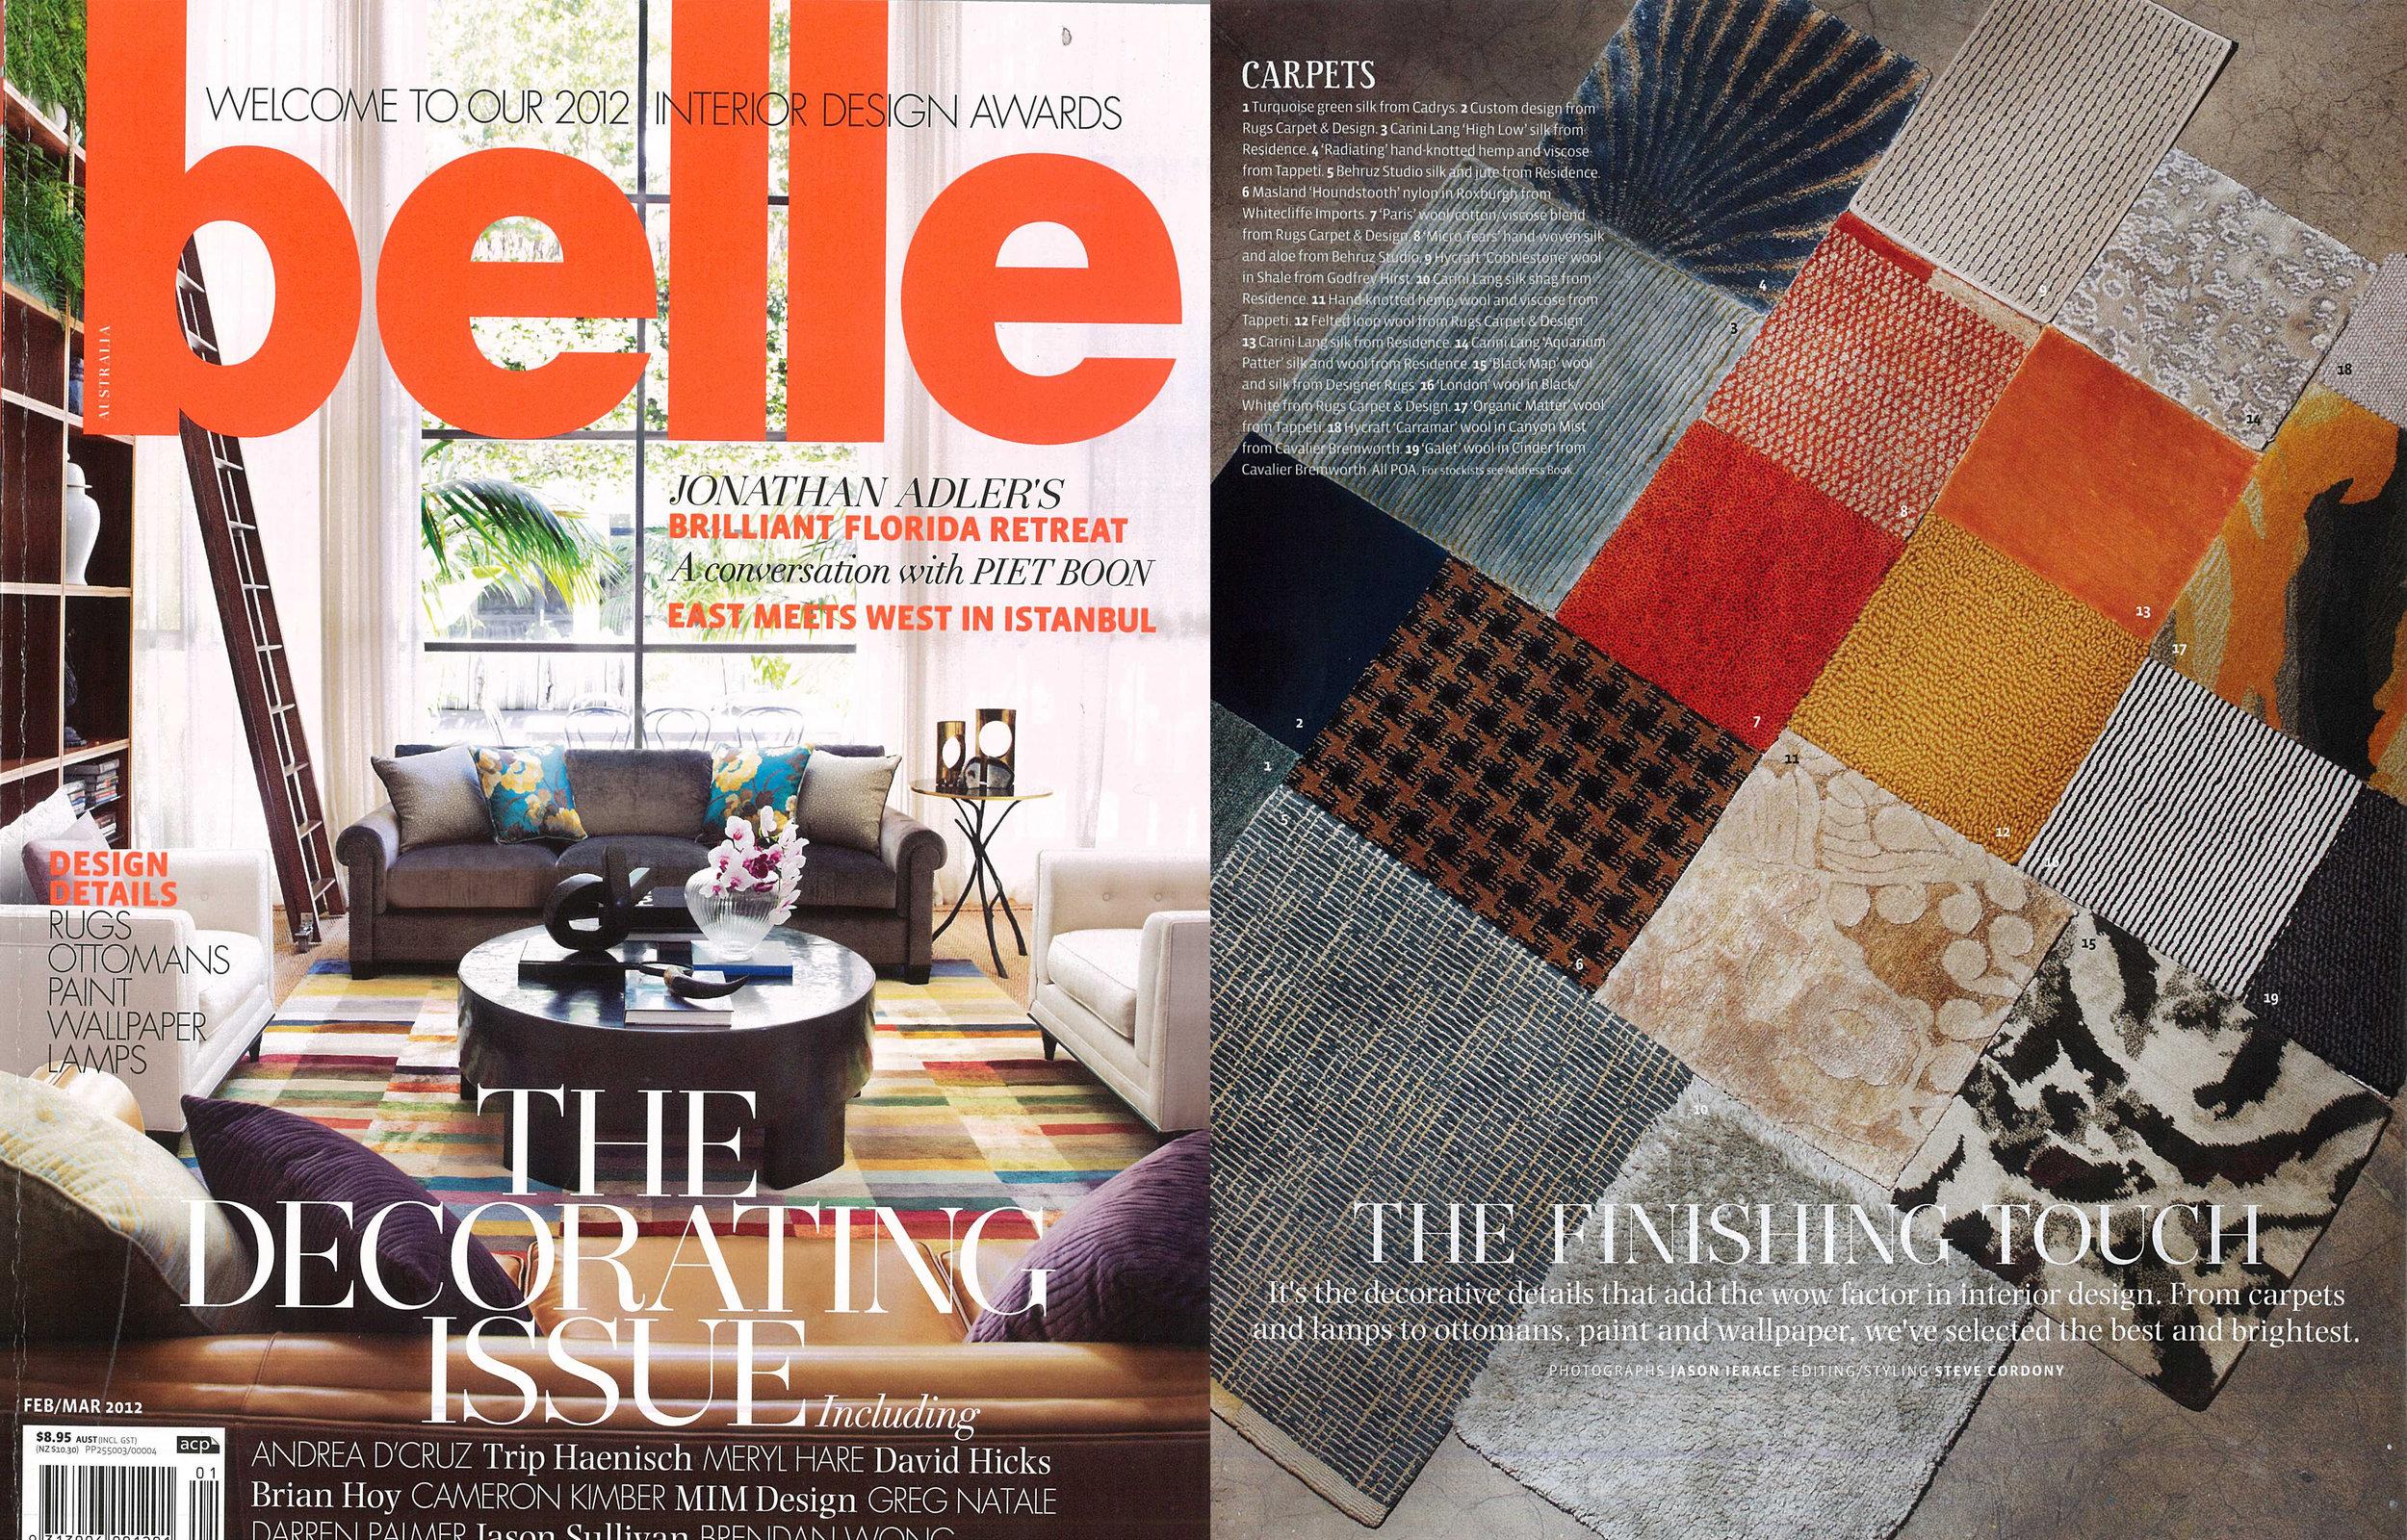 Belle Magazine - Feb/Mar 2012